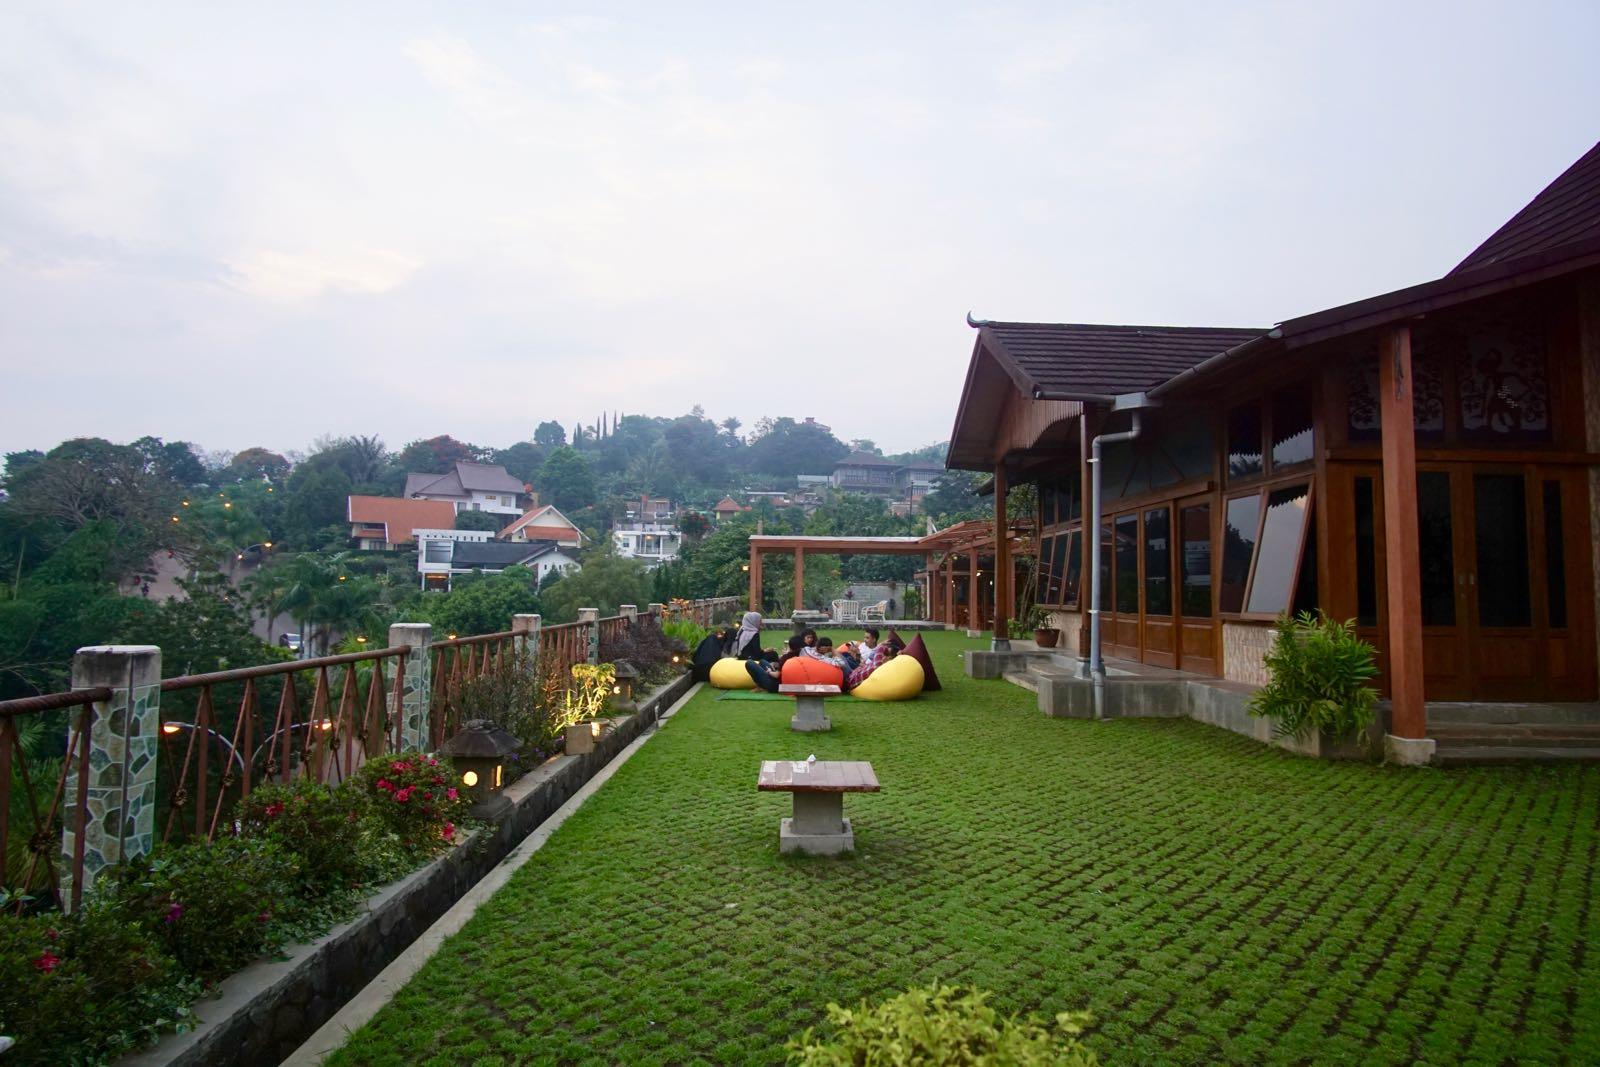 The Soko Bandung